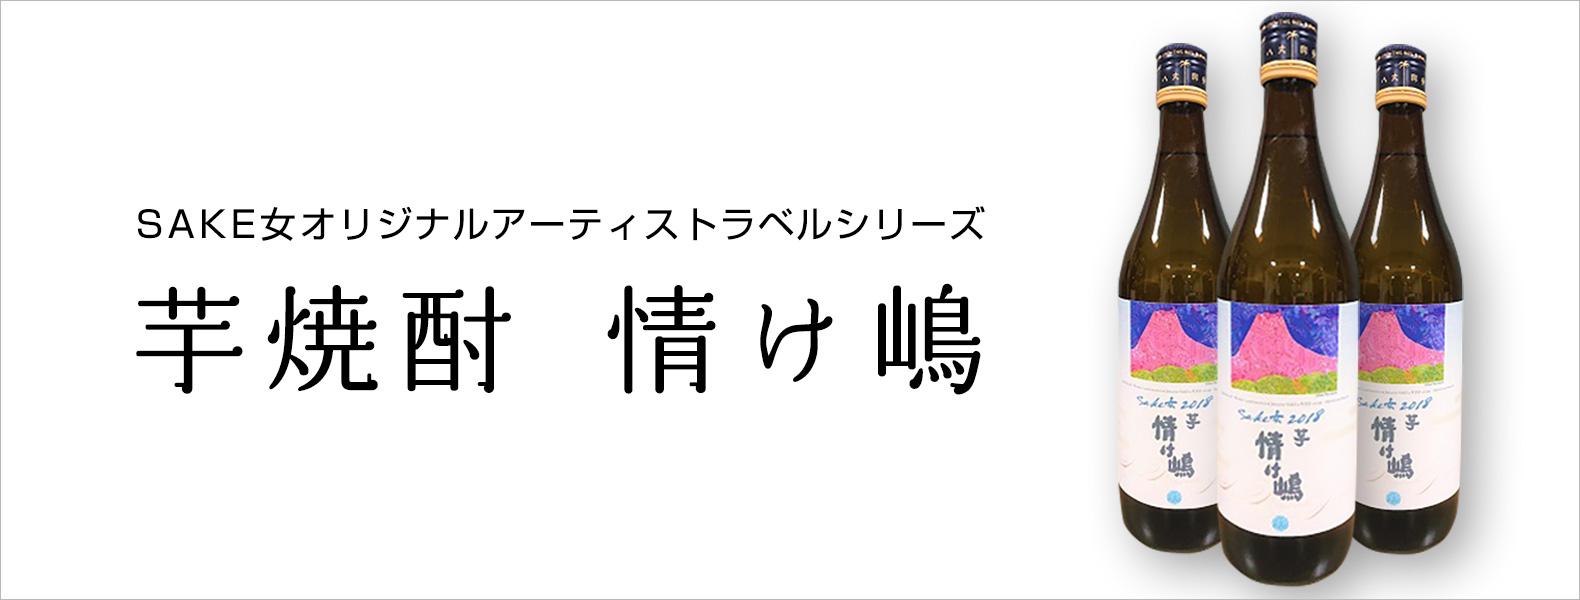 SAKE女オリジナル・アーティストラベルシリーズ 芋焼酎 情け嶋